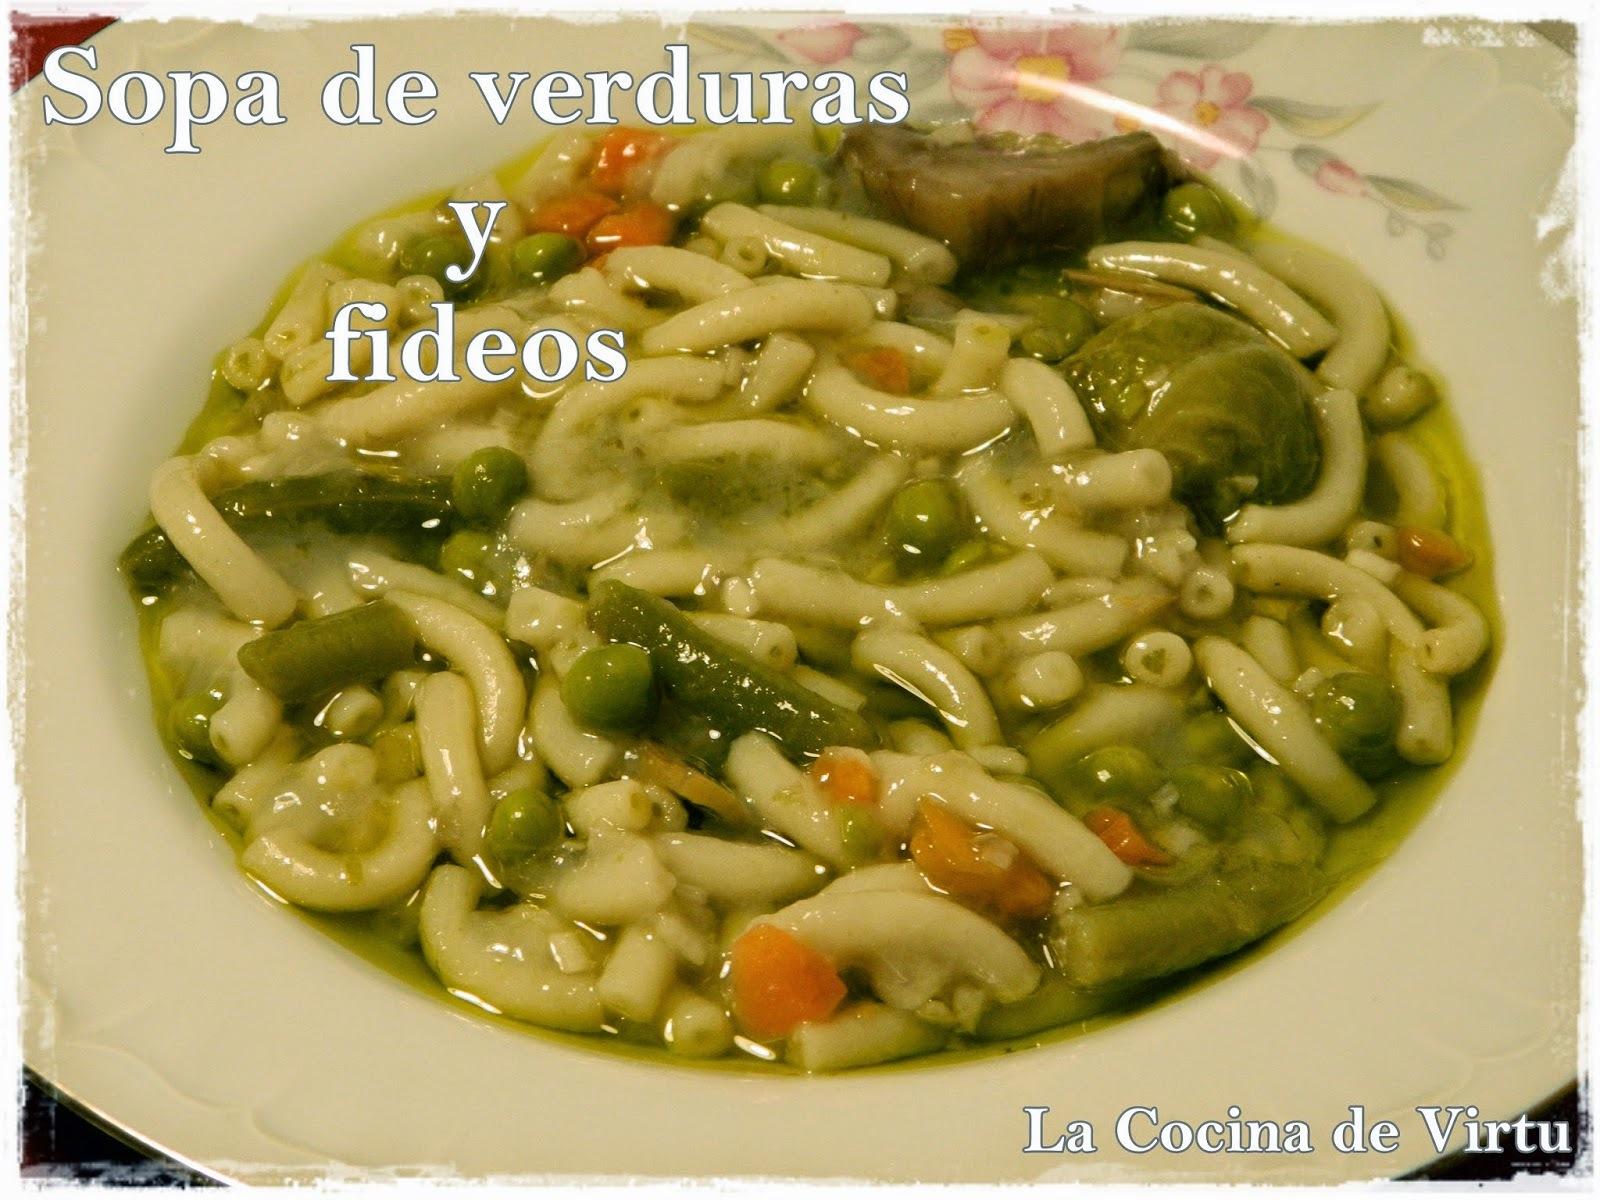 Sopa Verduras con fideos Cookeo